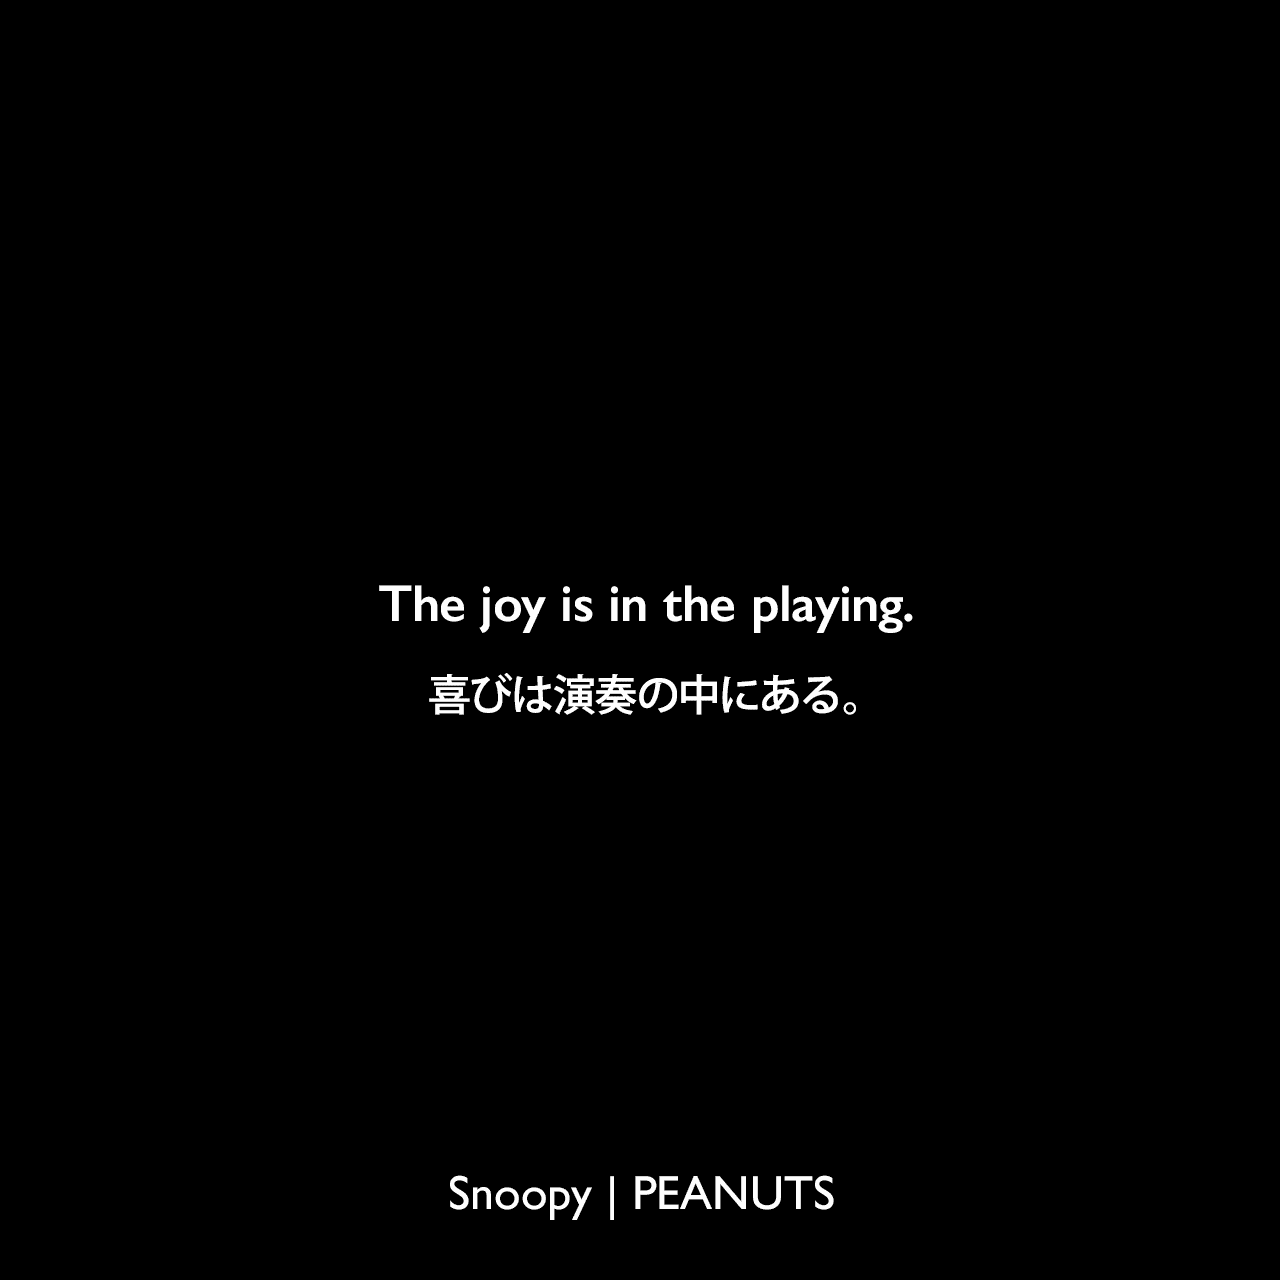 The joy is in the playing.喜びは演奏の中にある。- シュローダー (1973年1月27日のコミック)Charles Monroe Schulz